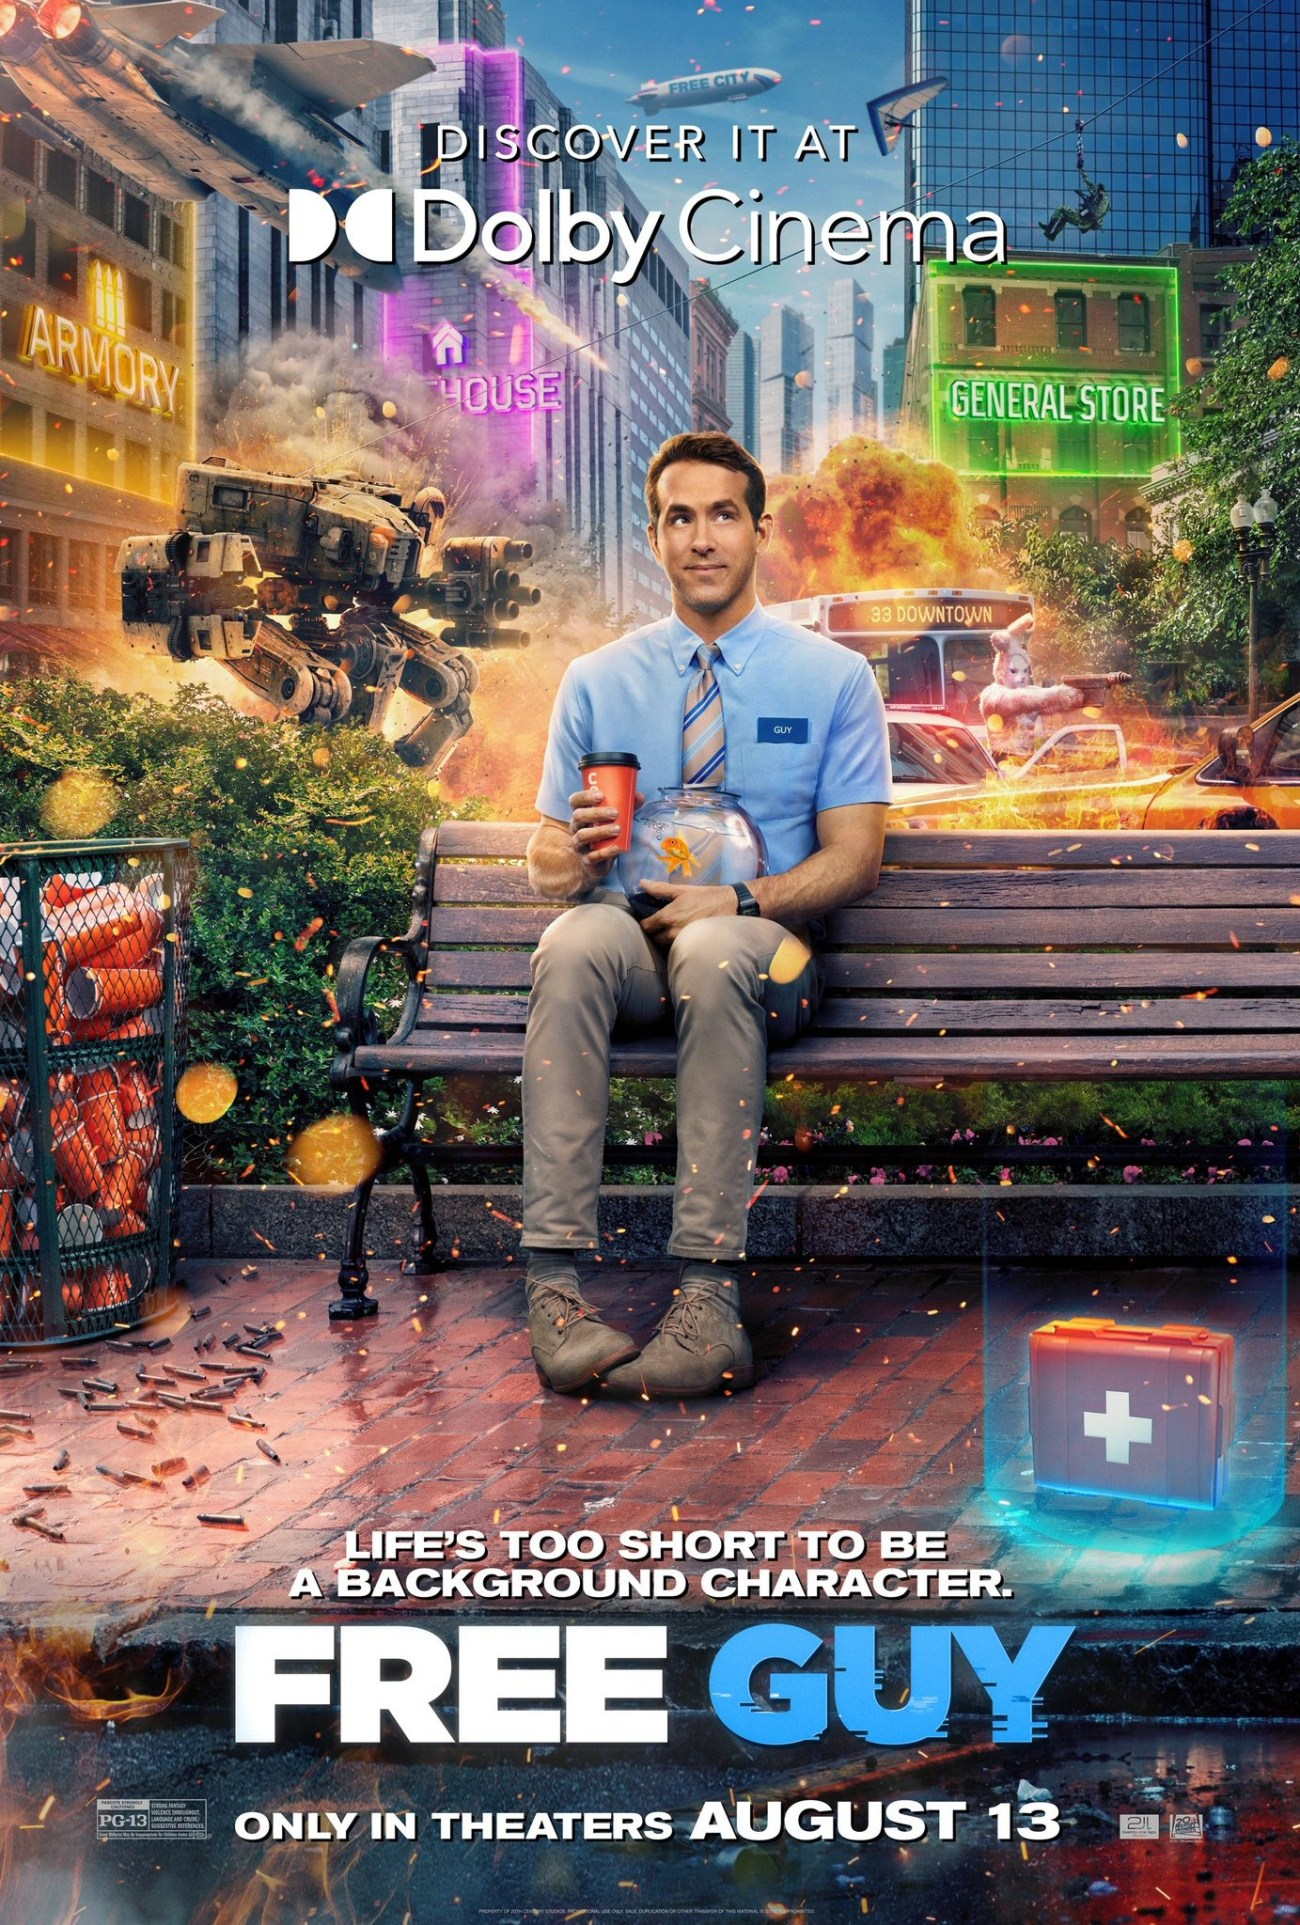 Póster Dolby Cinema de Free Guy (2021). Imagen: impawards.com